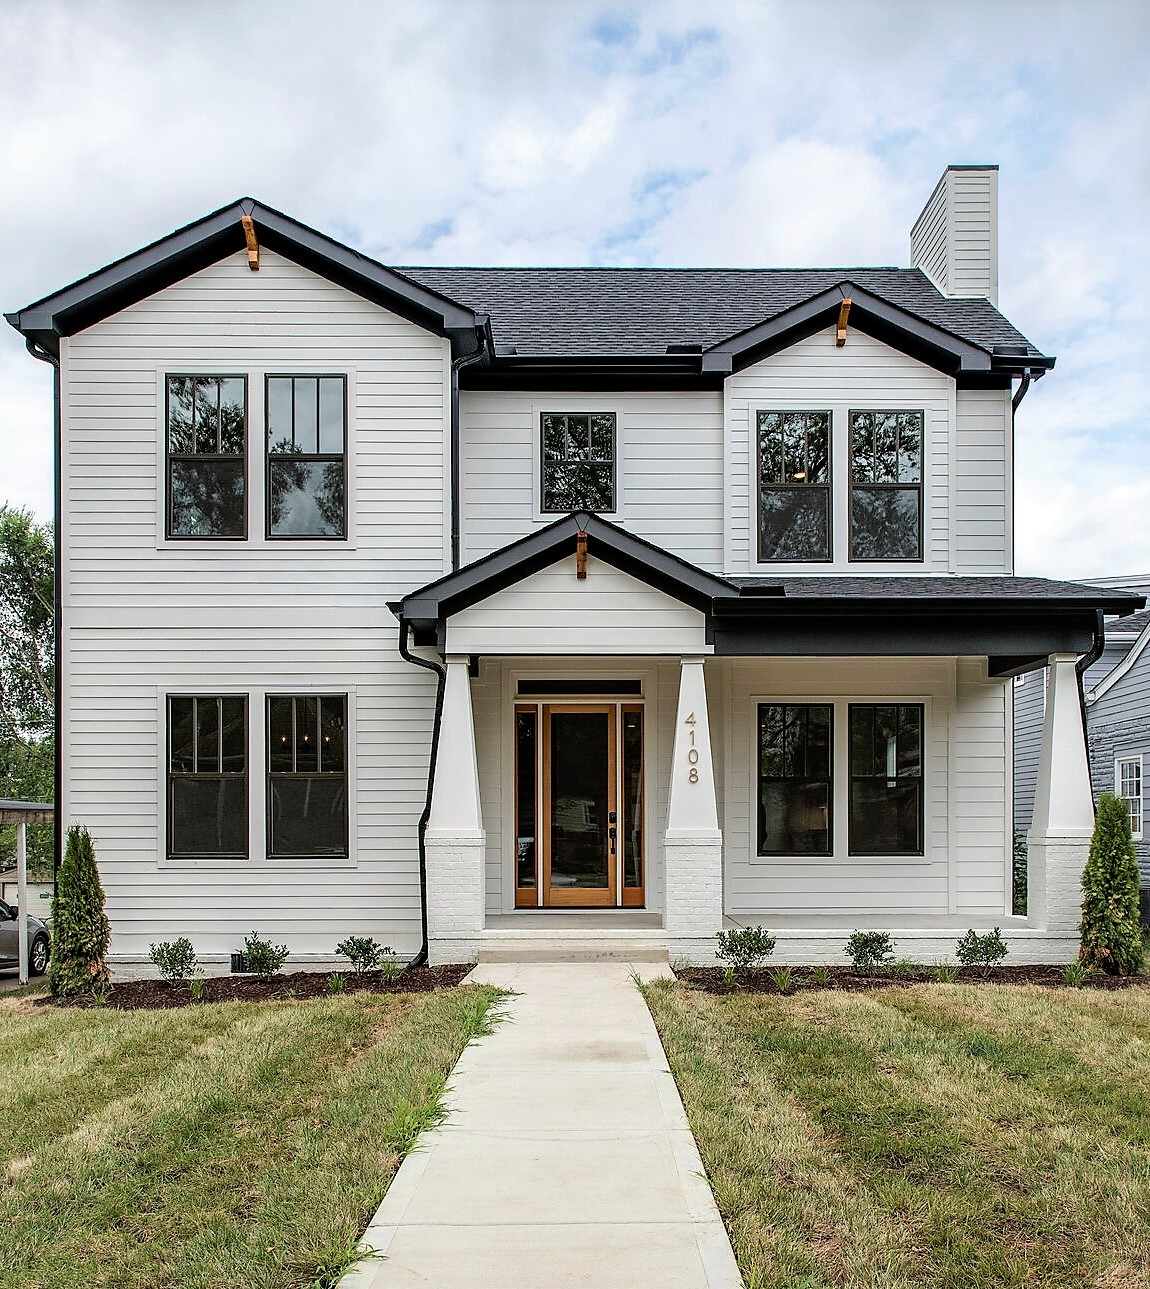 4108 Wyoming Ave, Nashville, TN 37209 - Nashville, TN real estate listing